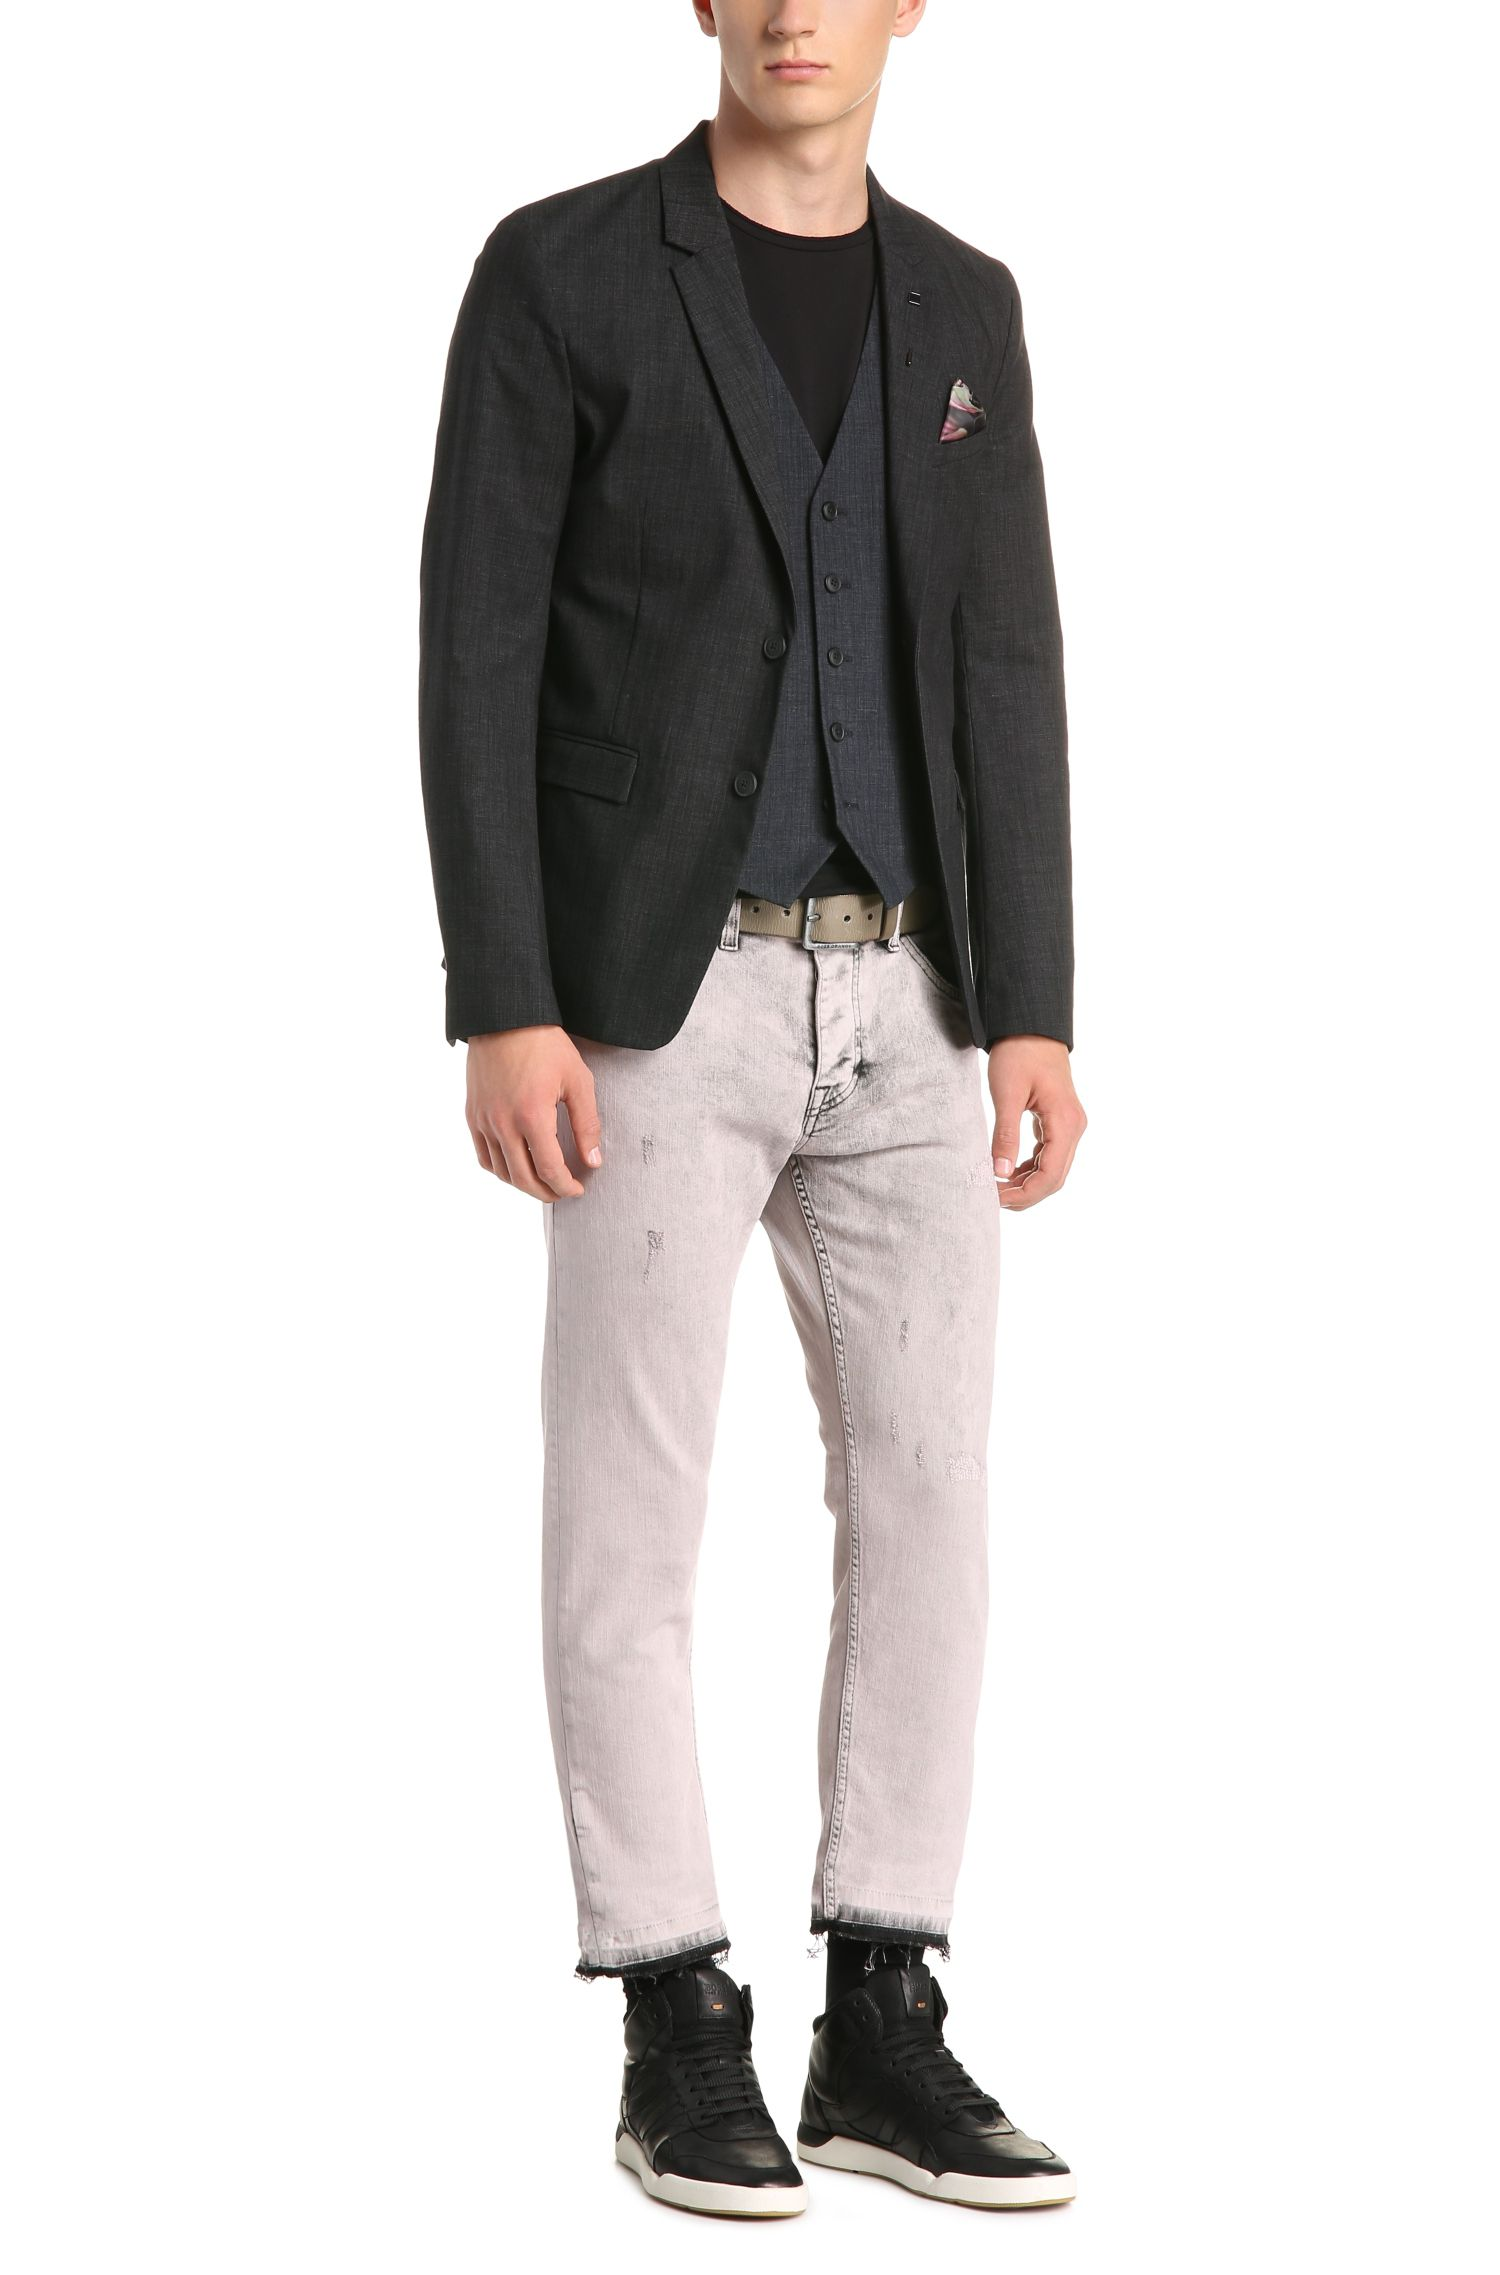 Stretch Cotton Blend Melange Waistcoast, Slim Fit | Bacer BS, Dark Blue